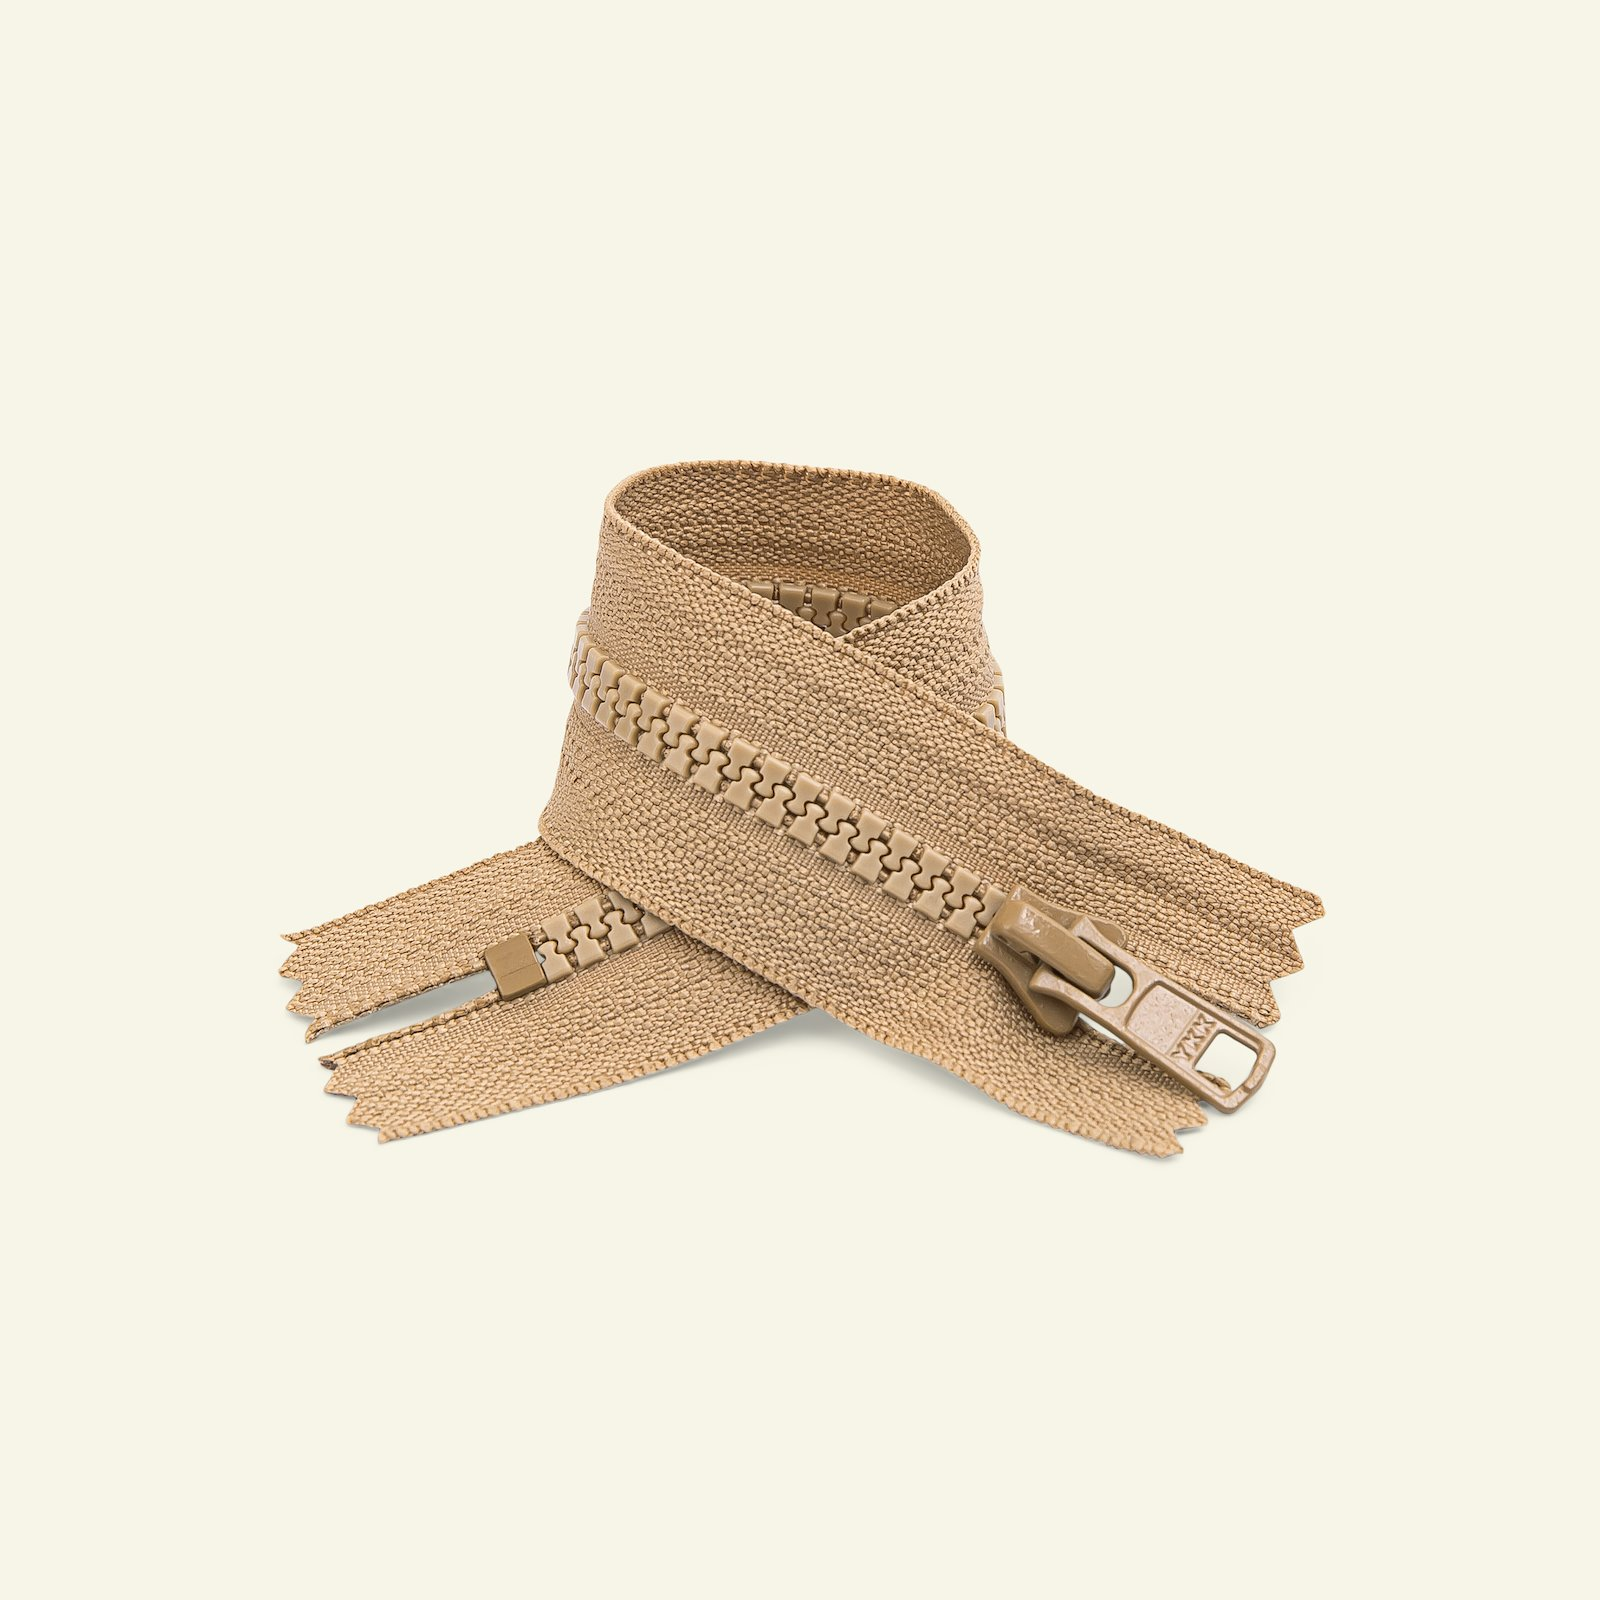 YKK zip 6mm closed end dark beige x50130_pack